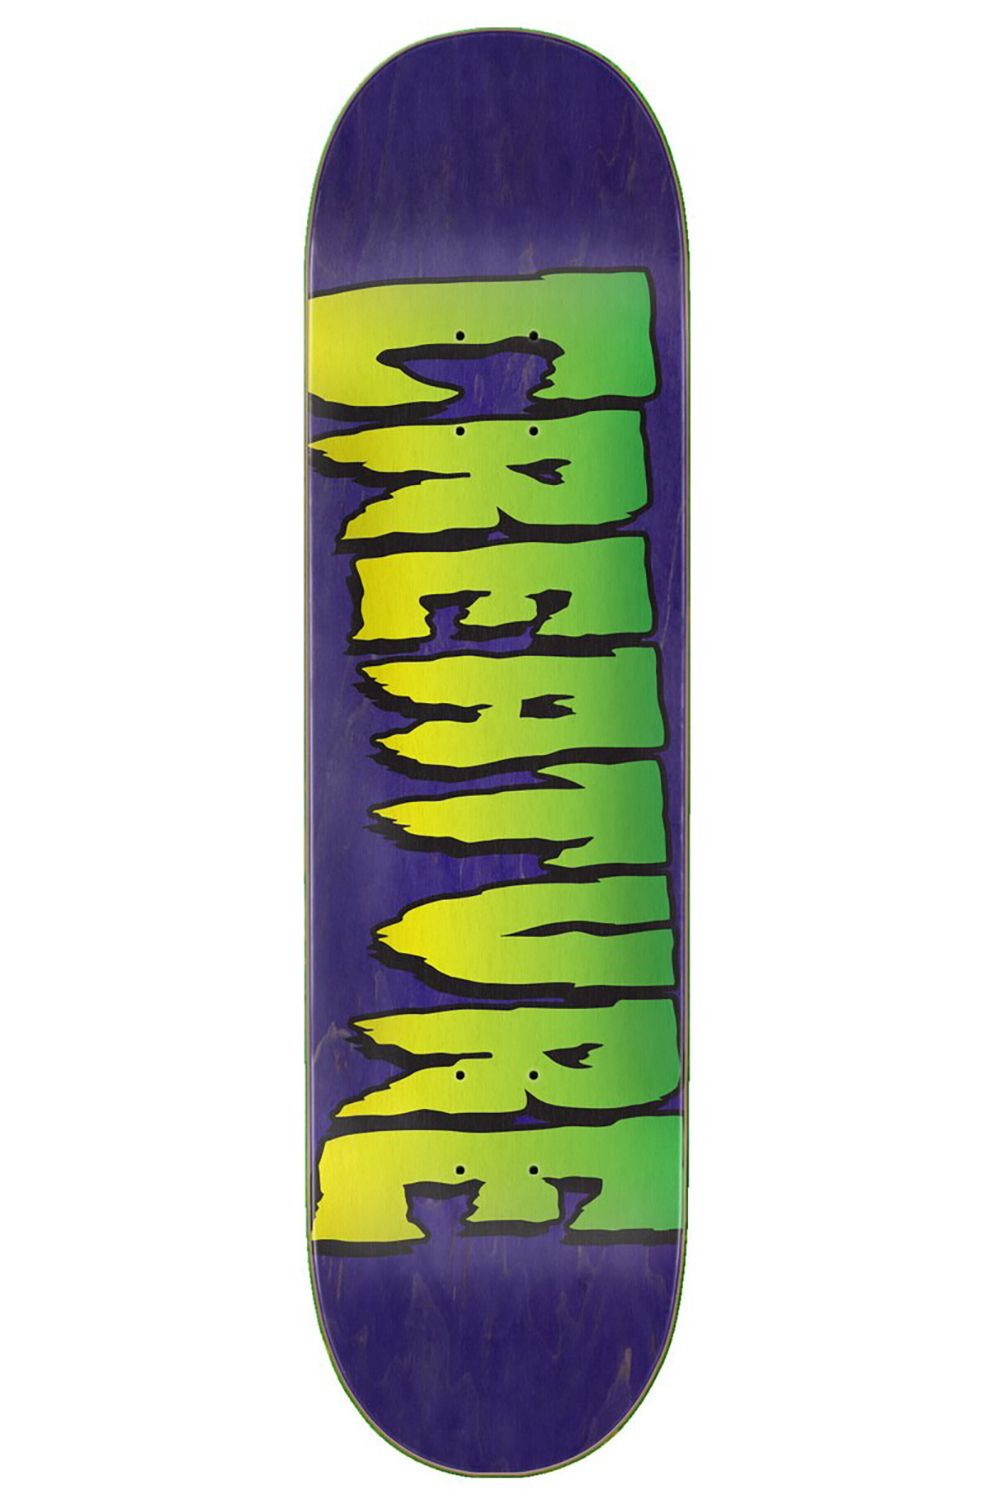 "Creature Skate Board LOGO STUMP 8.25"" x 31.8"" Purple"